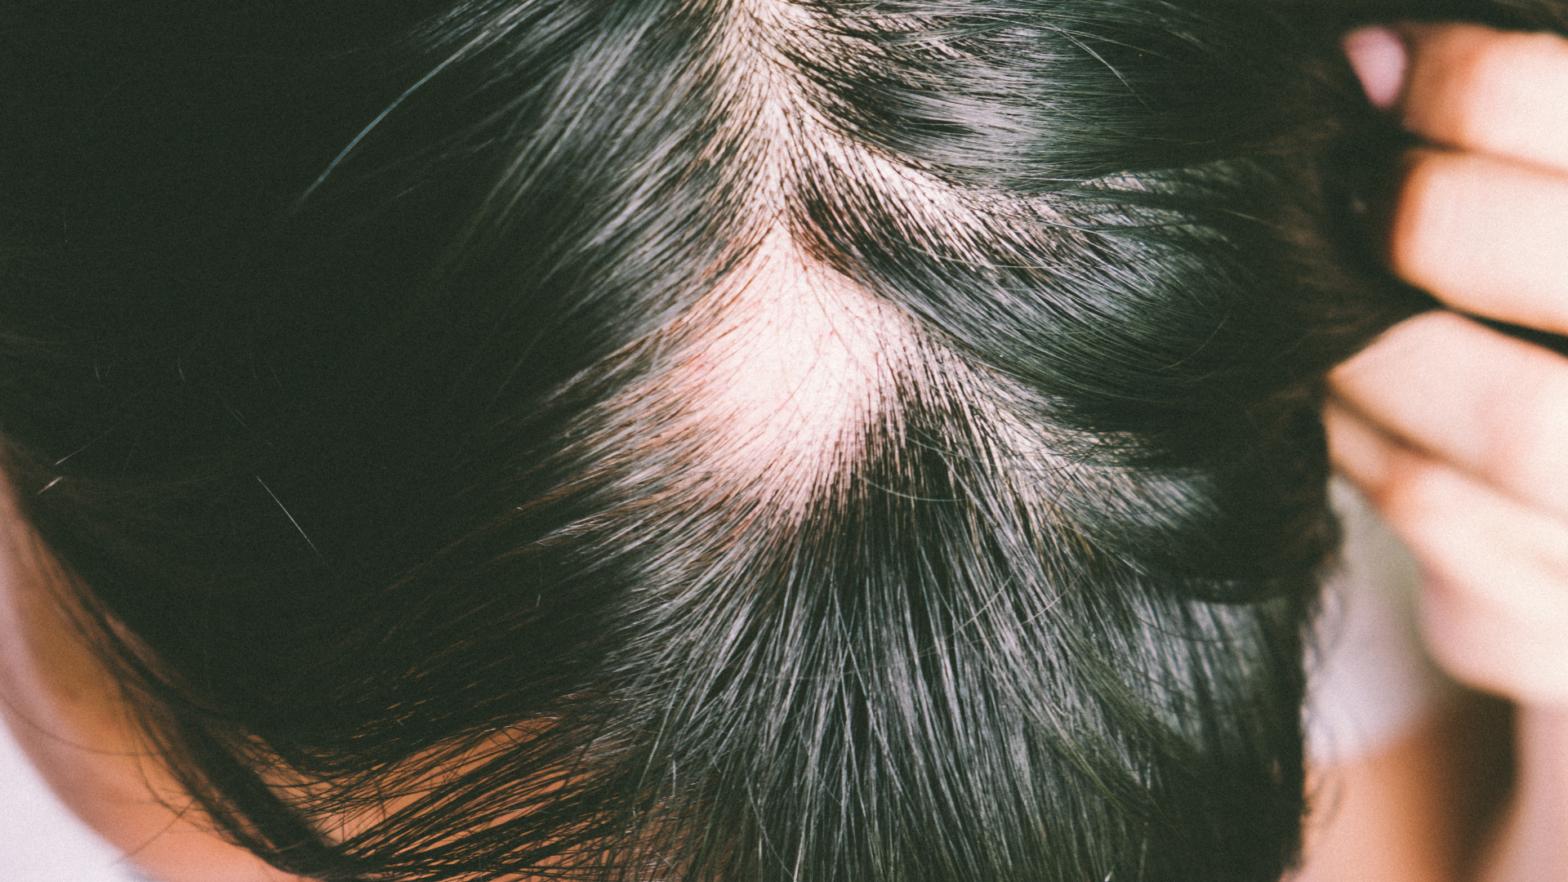 Covid e queda de cabelo